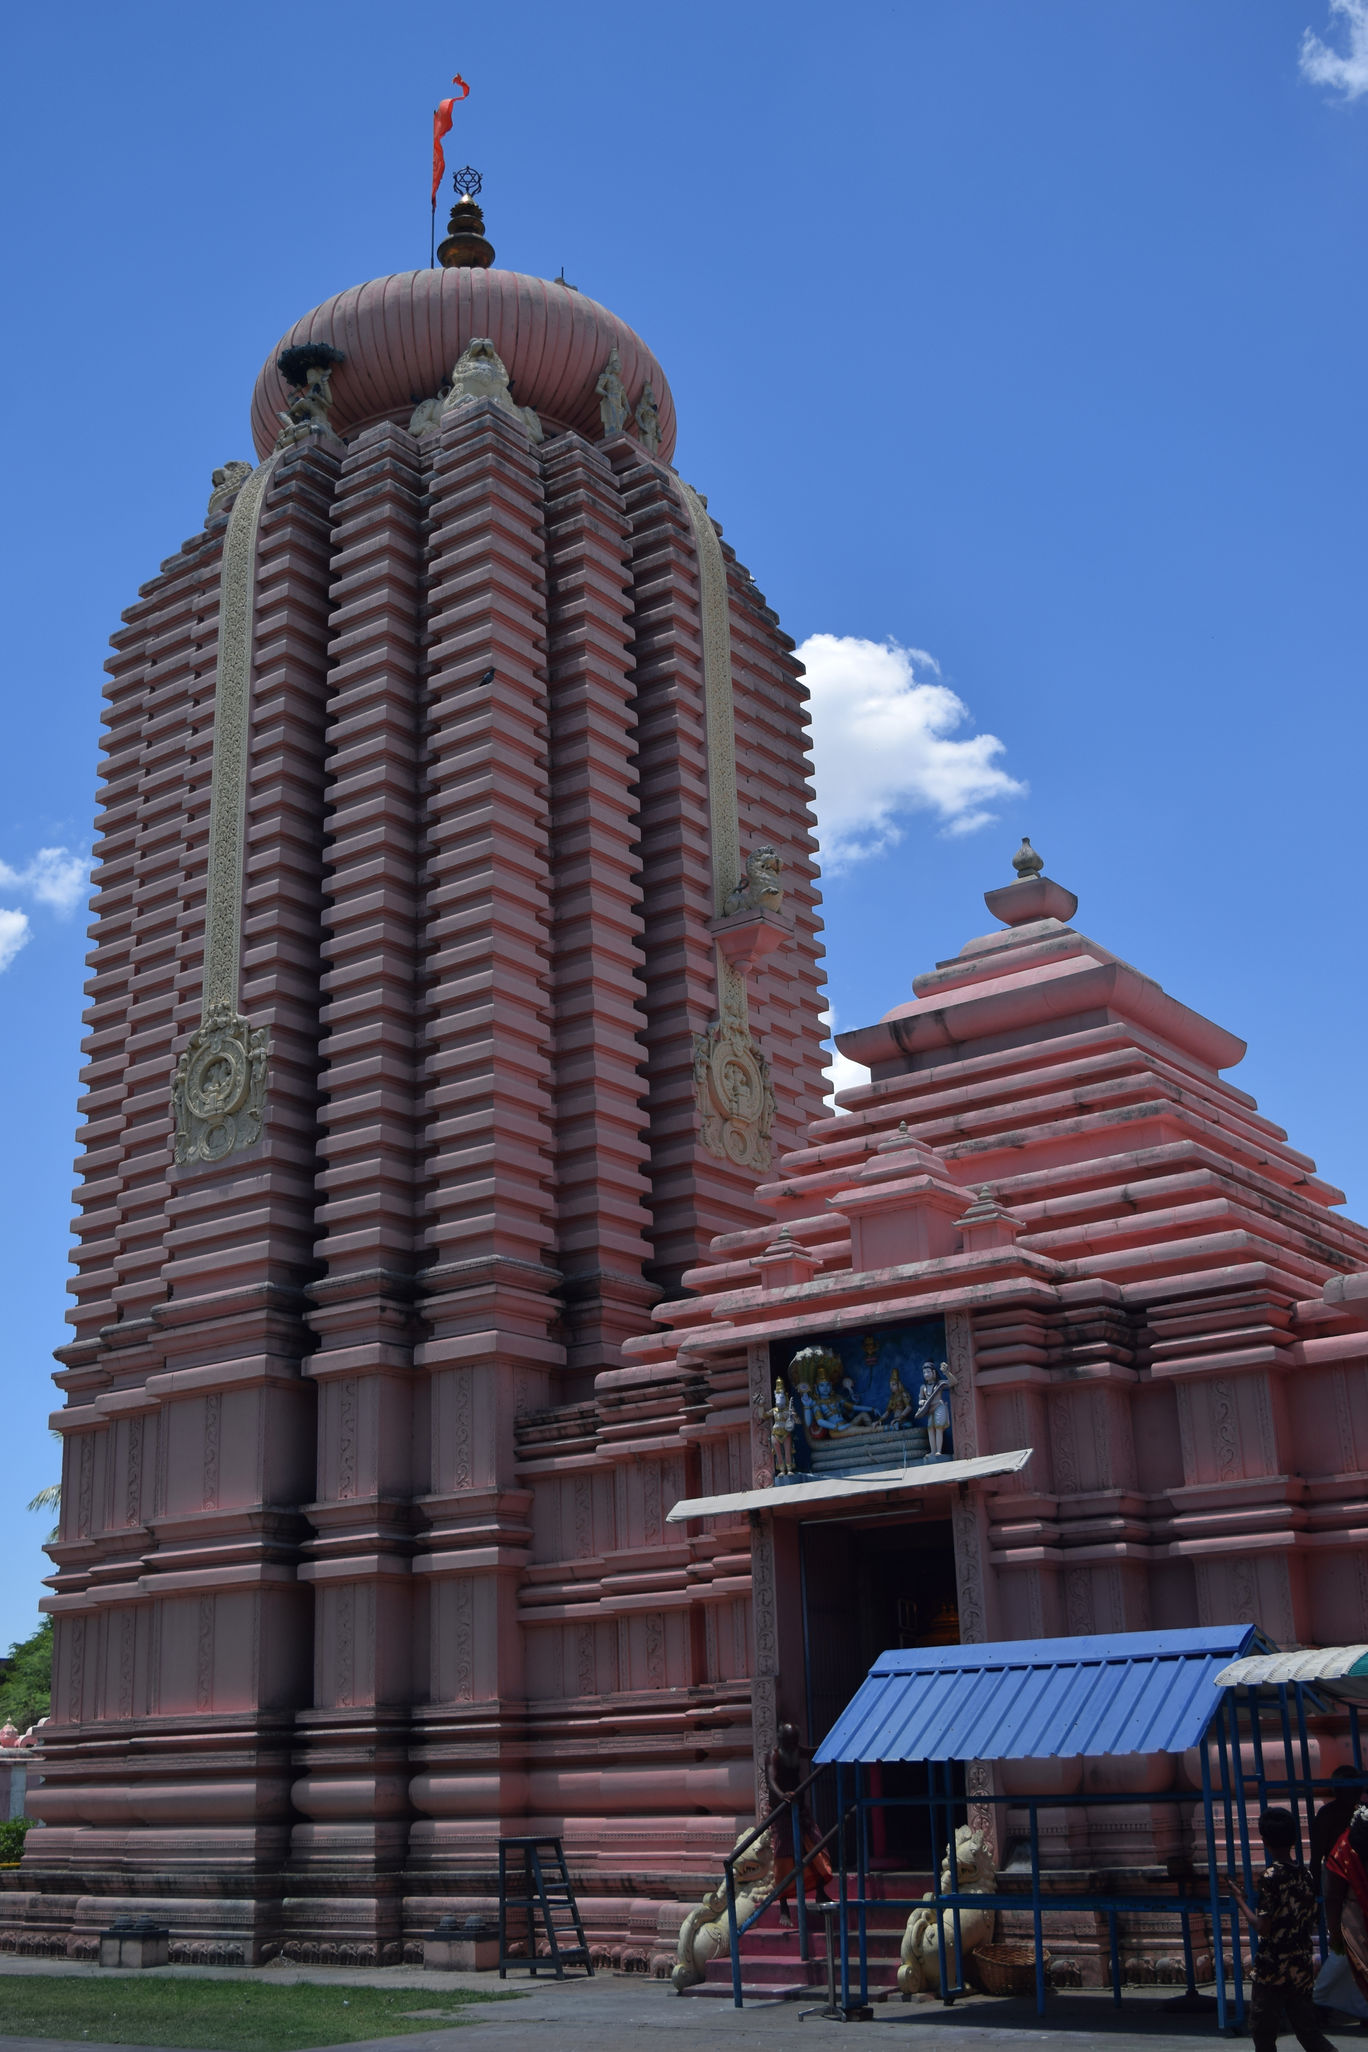 Photo of Sri Pandu Ranga Perumal Temple By Bhaarath Karunagaran